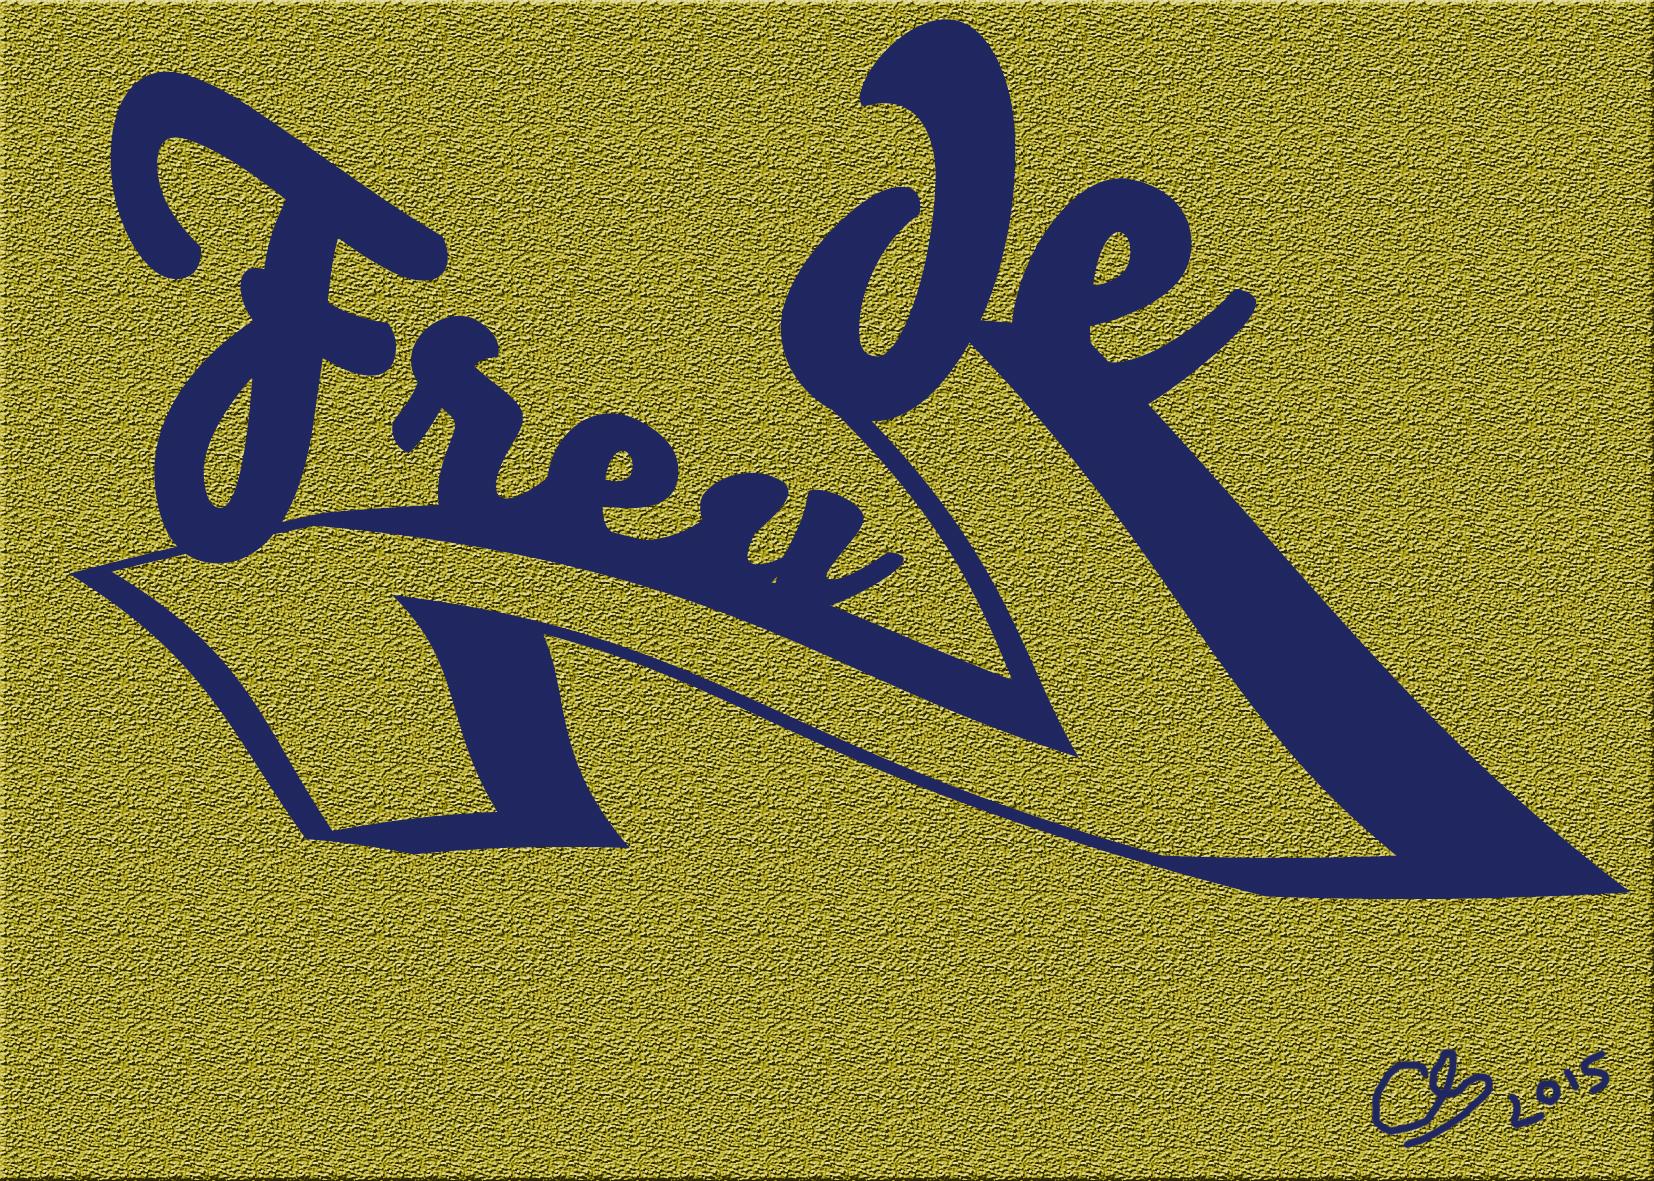 FREUDE :-)